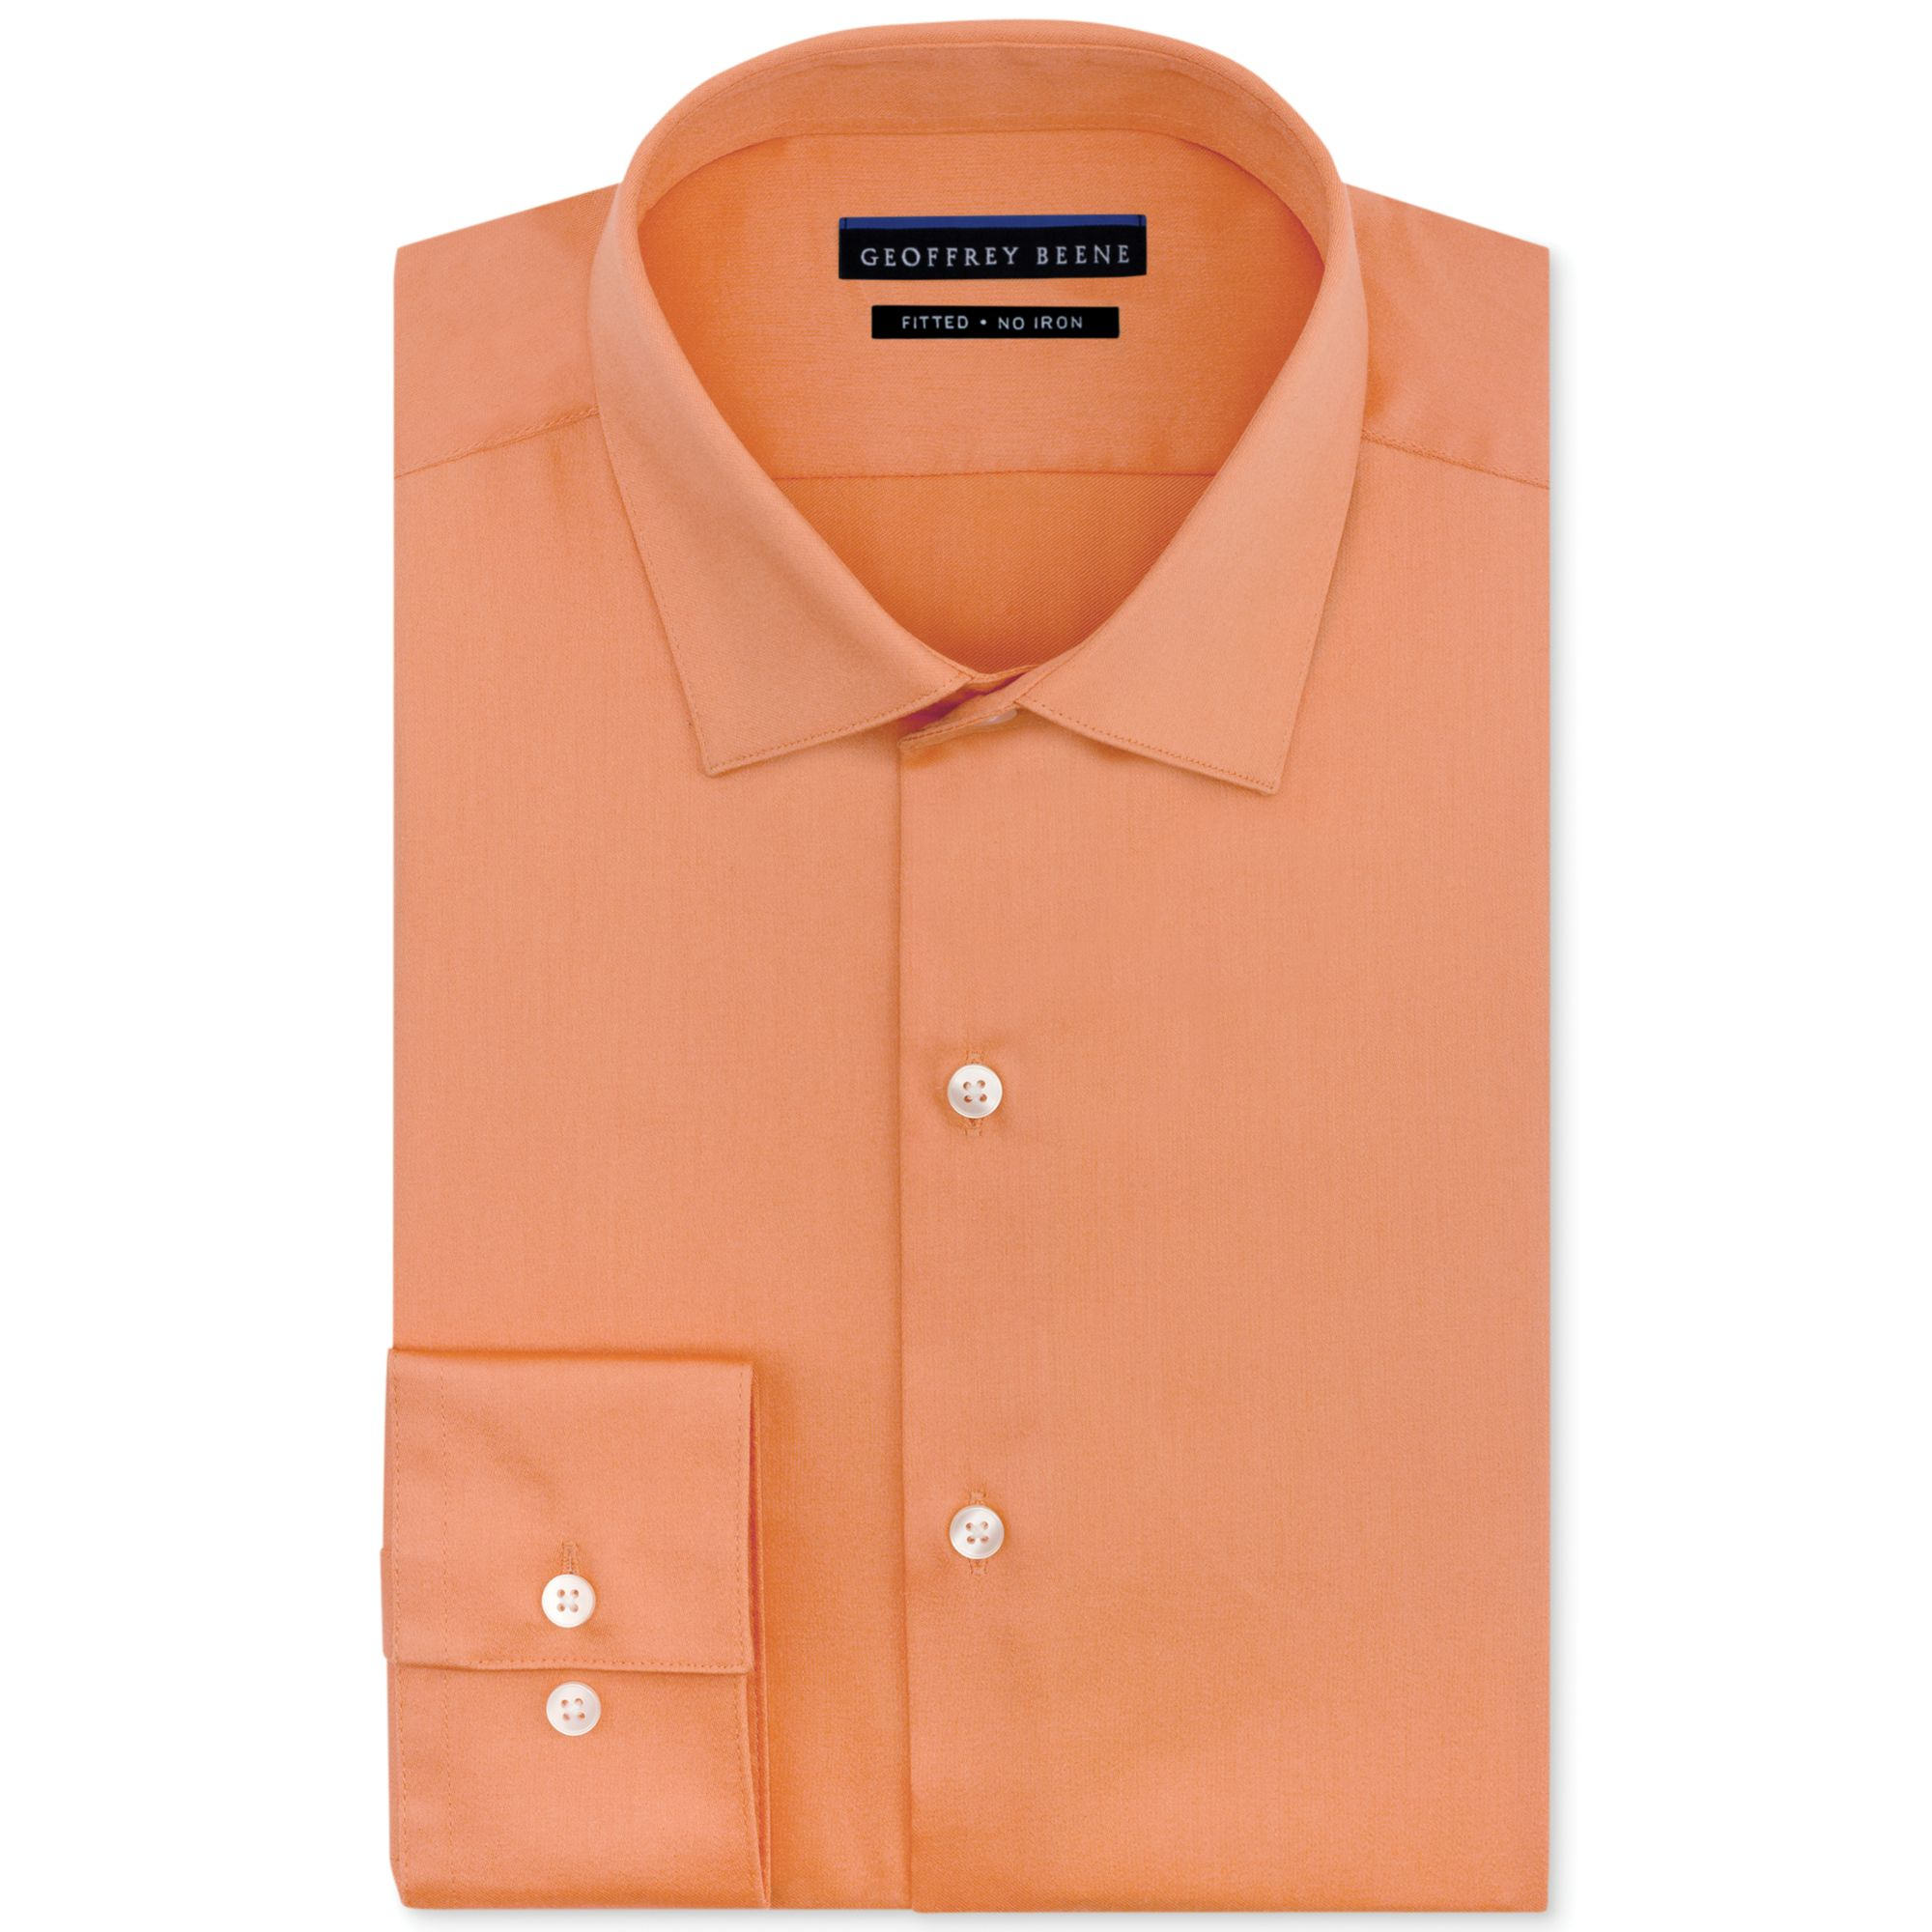 Lyst Geoffrey Beene Noniron Sateen Solid Dress Shirt In Orange For Men